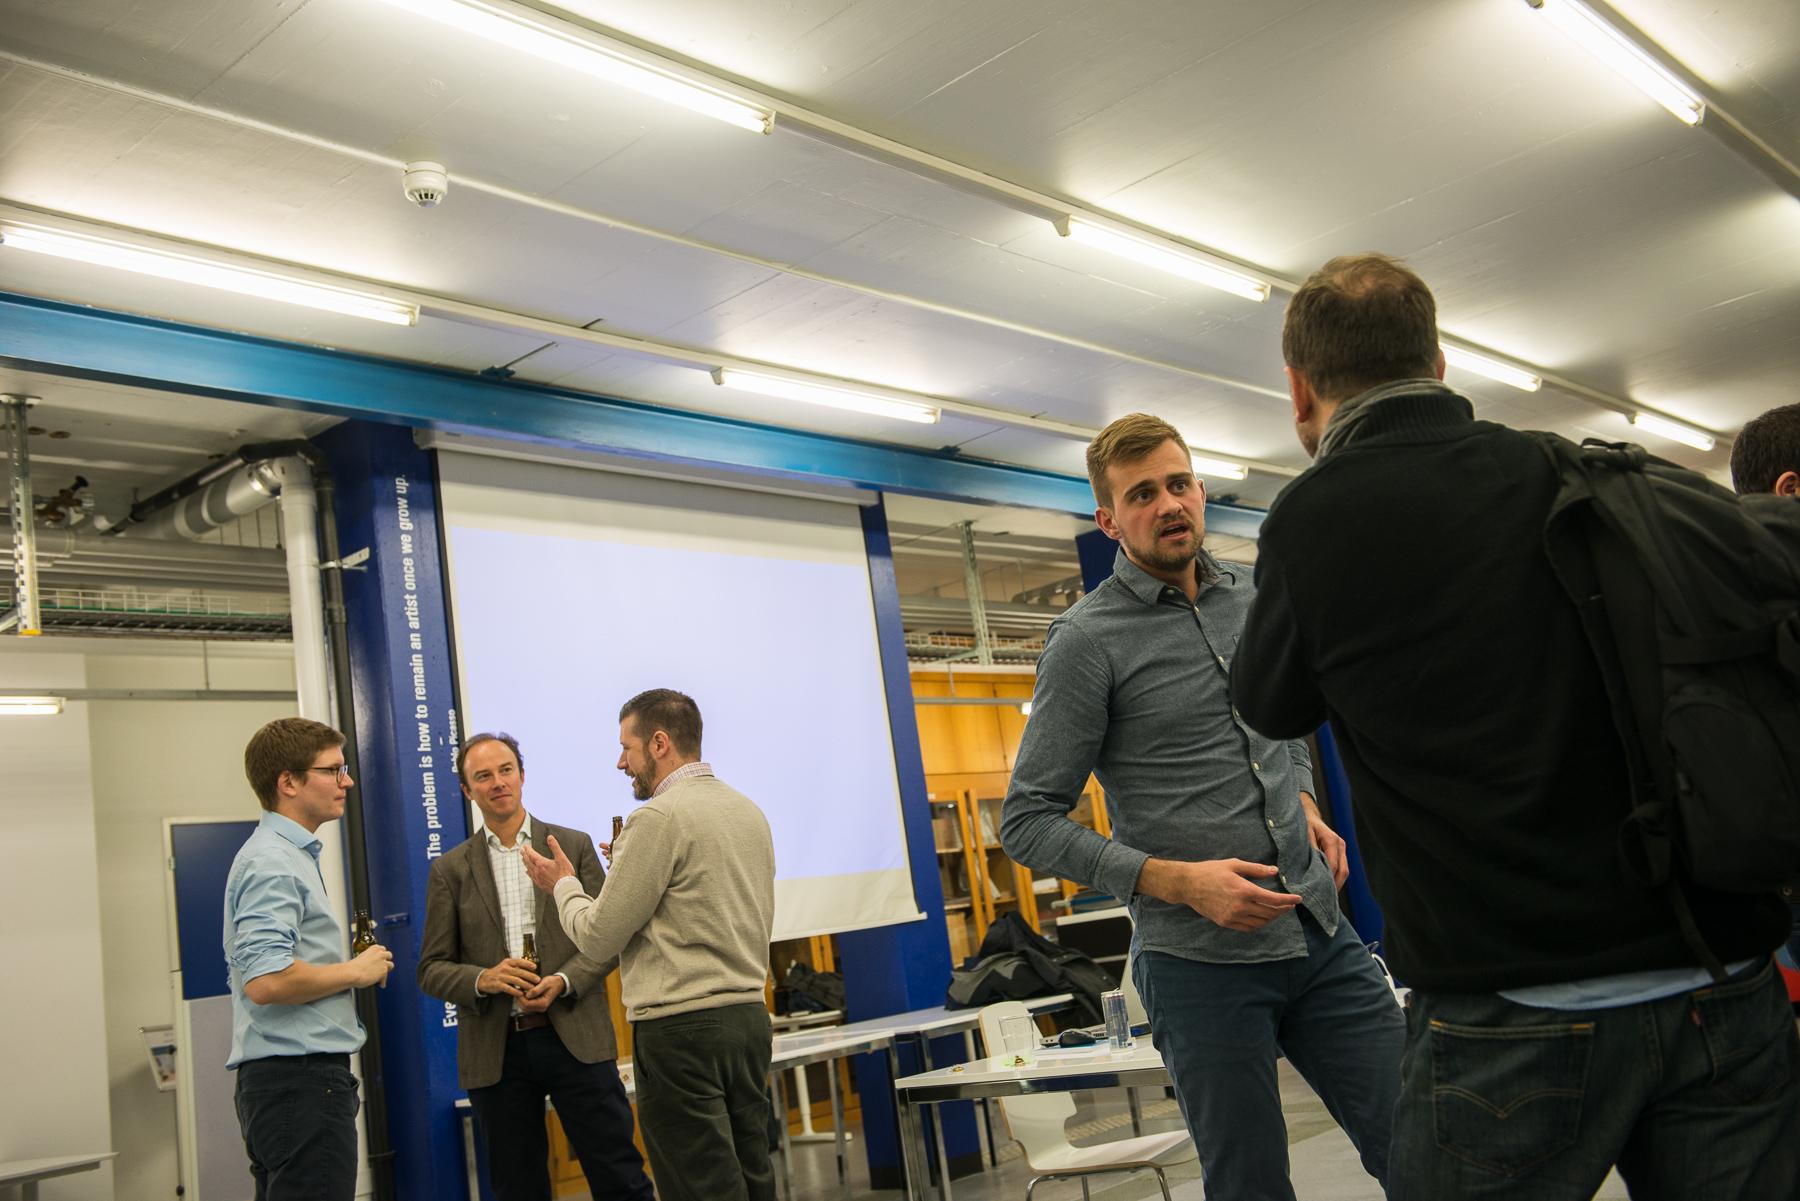 2017-11-16_InnovationClub_37_web.jpg